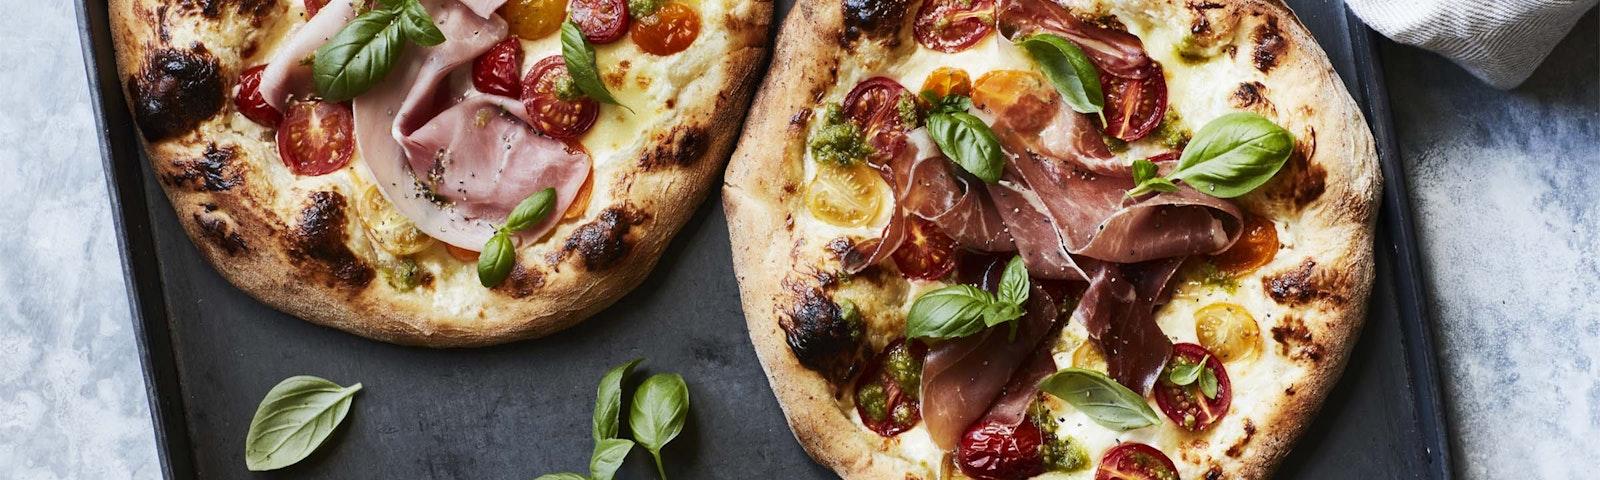 Langtidshævet pizza bianca caprese